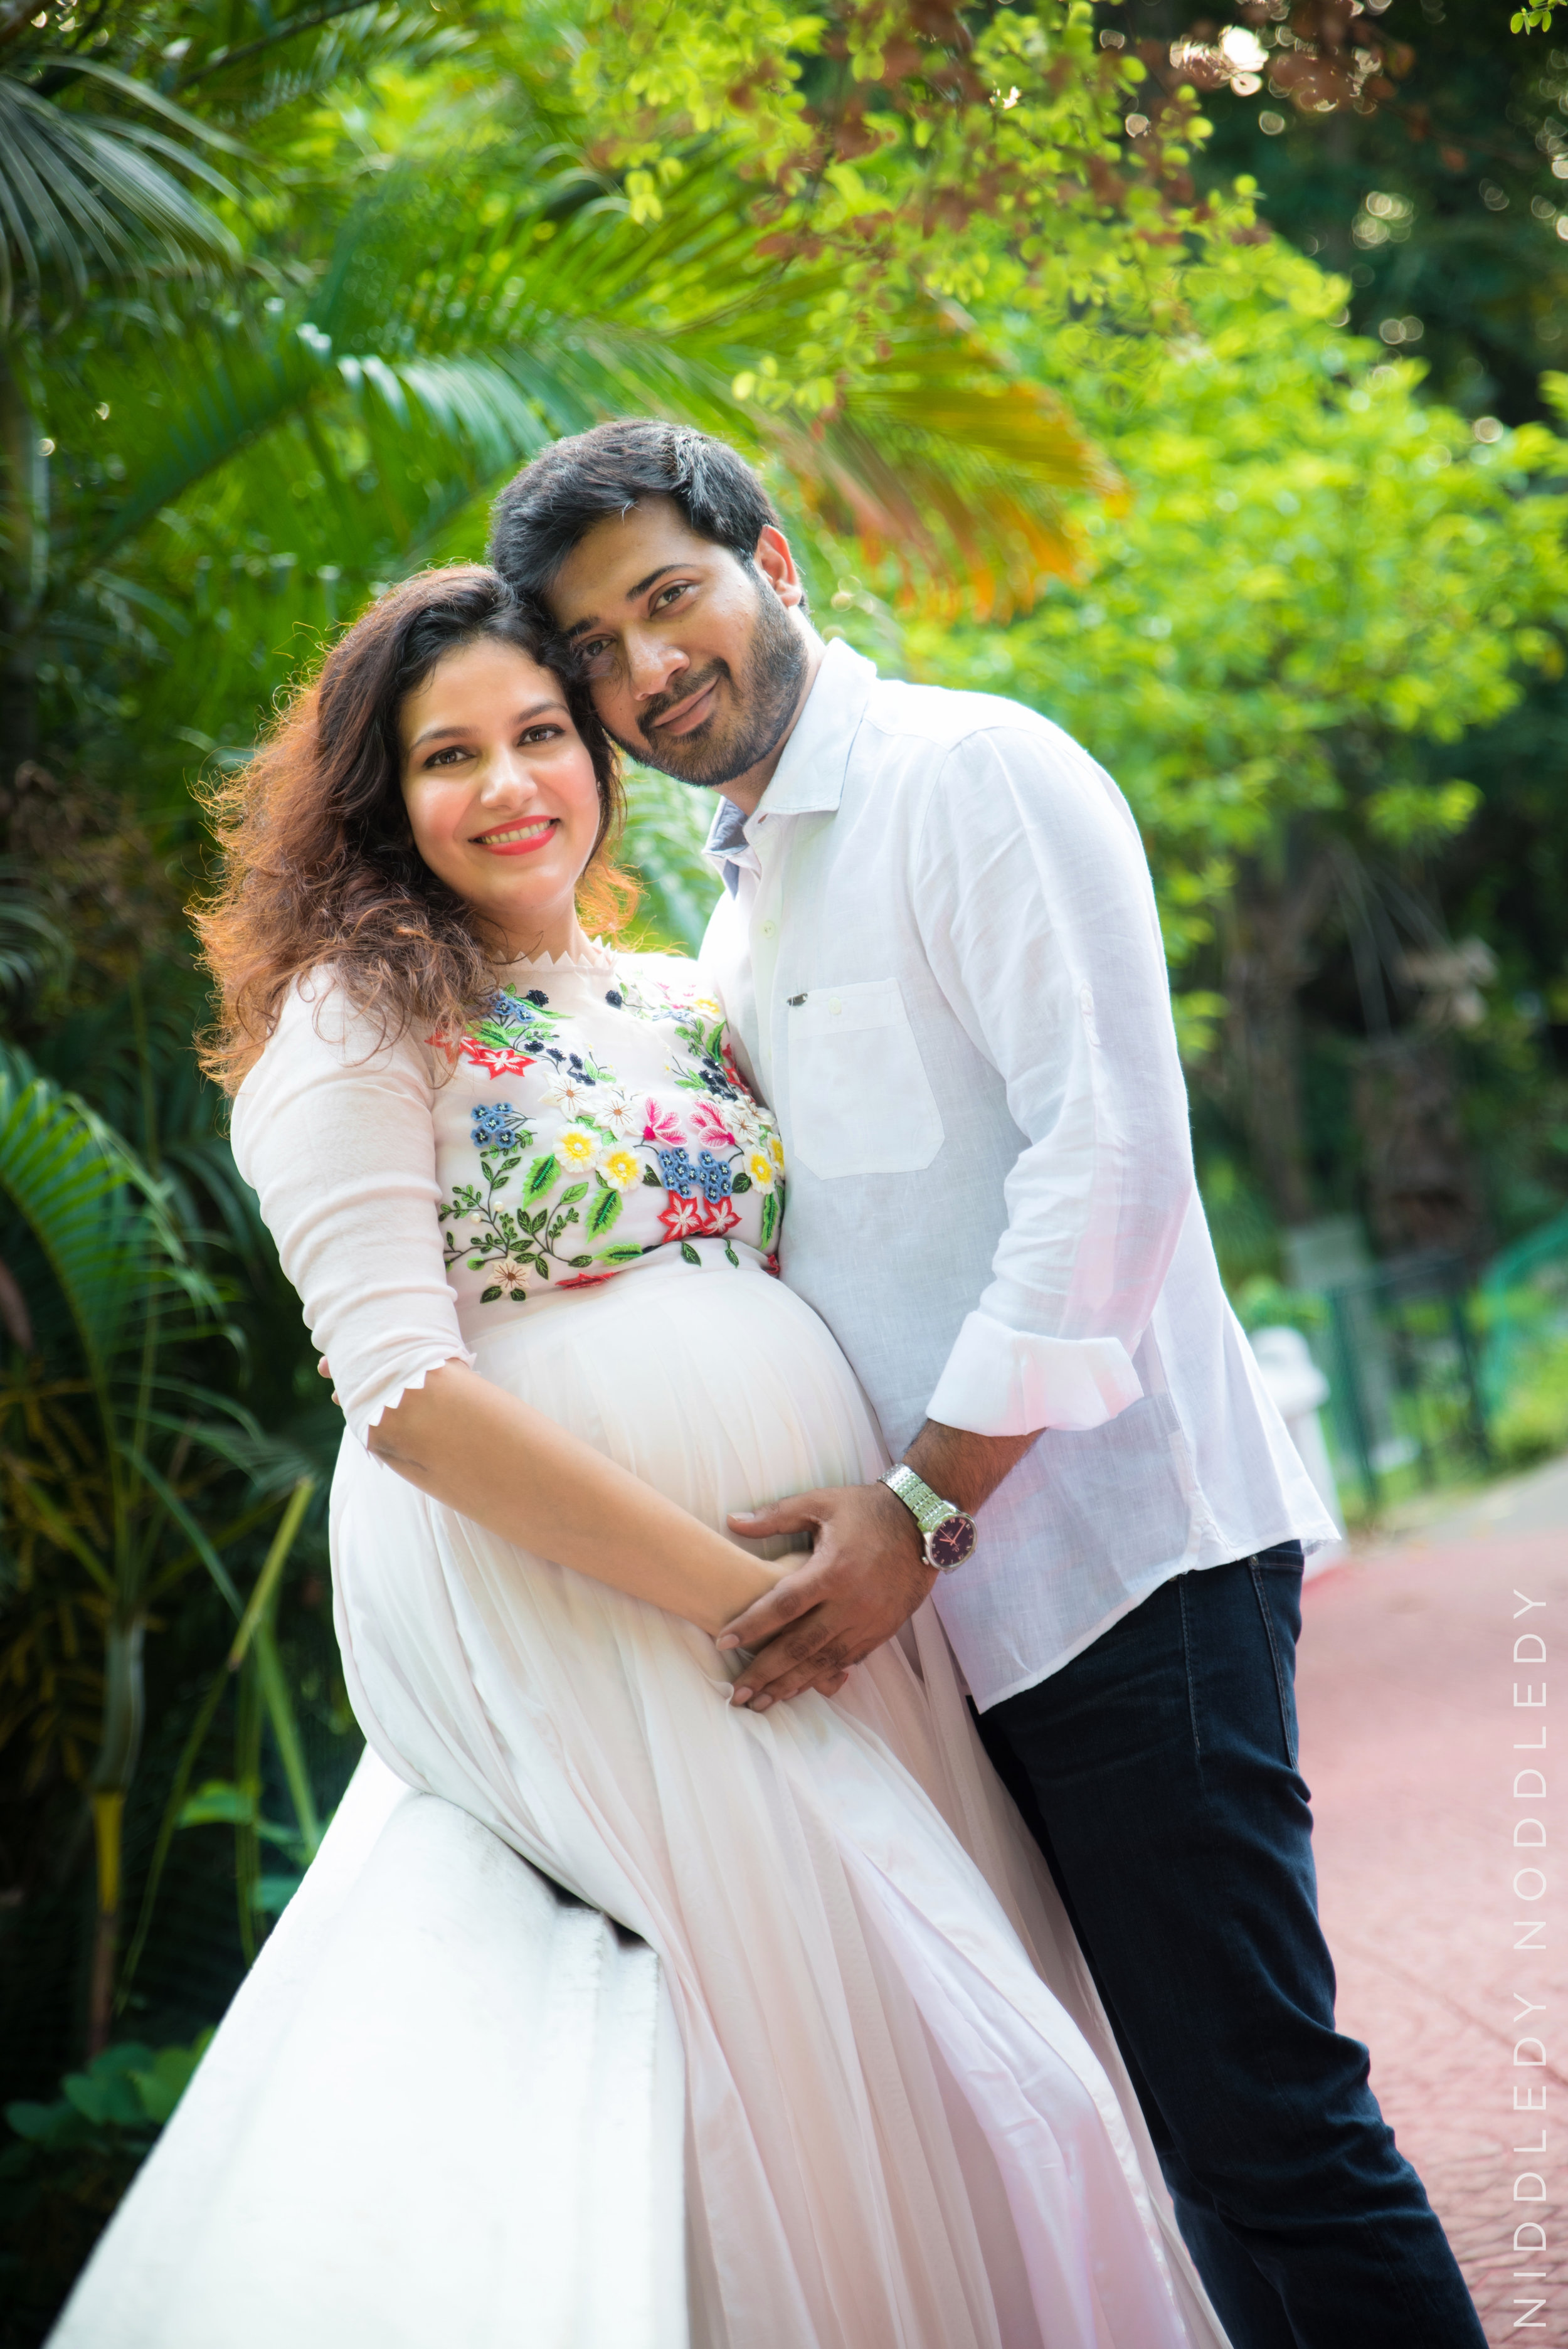 Richa Maternity Photoshoot ❤ NiddledyNoddledy.com ~ Bumps to Babies Photography, Kolkata - 07.jpg